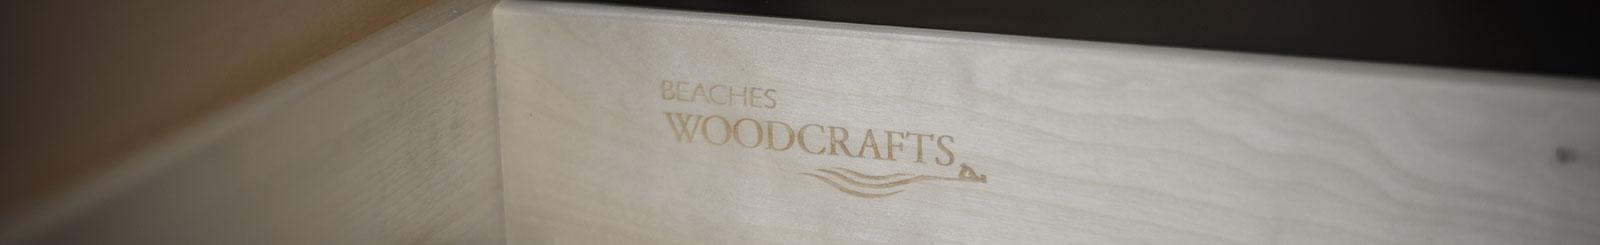 Beaches Woodcraft Jacksonville Florida